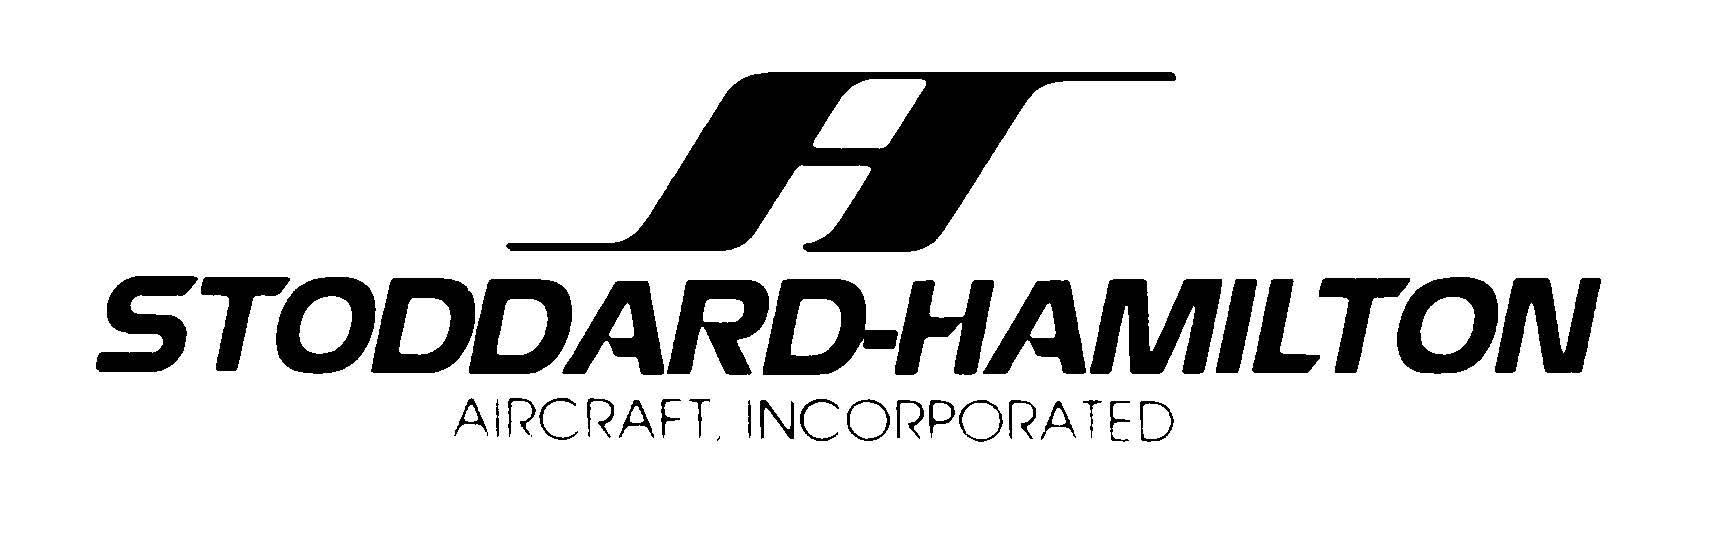 Stoddard-Hamilton Logo